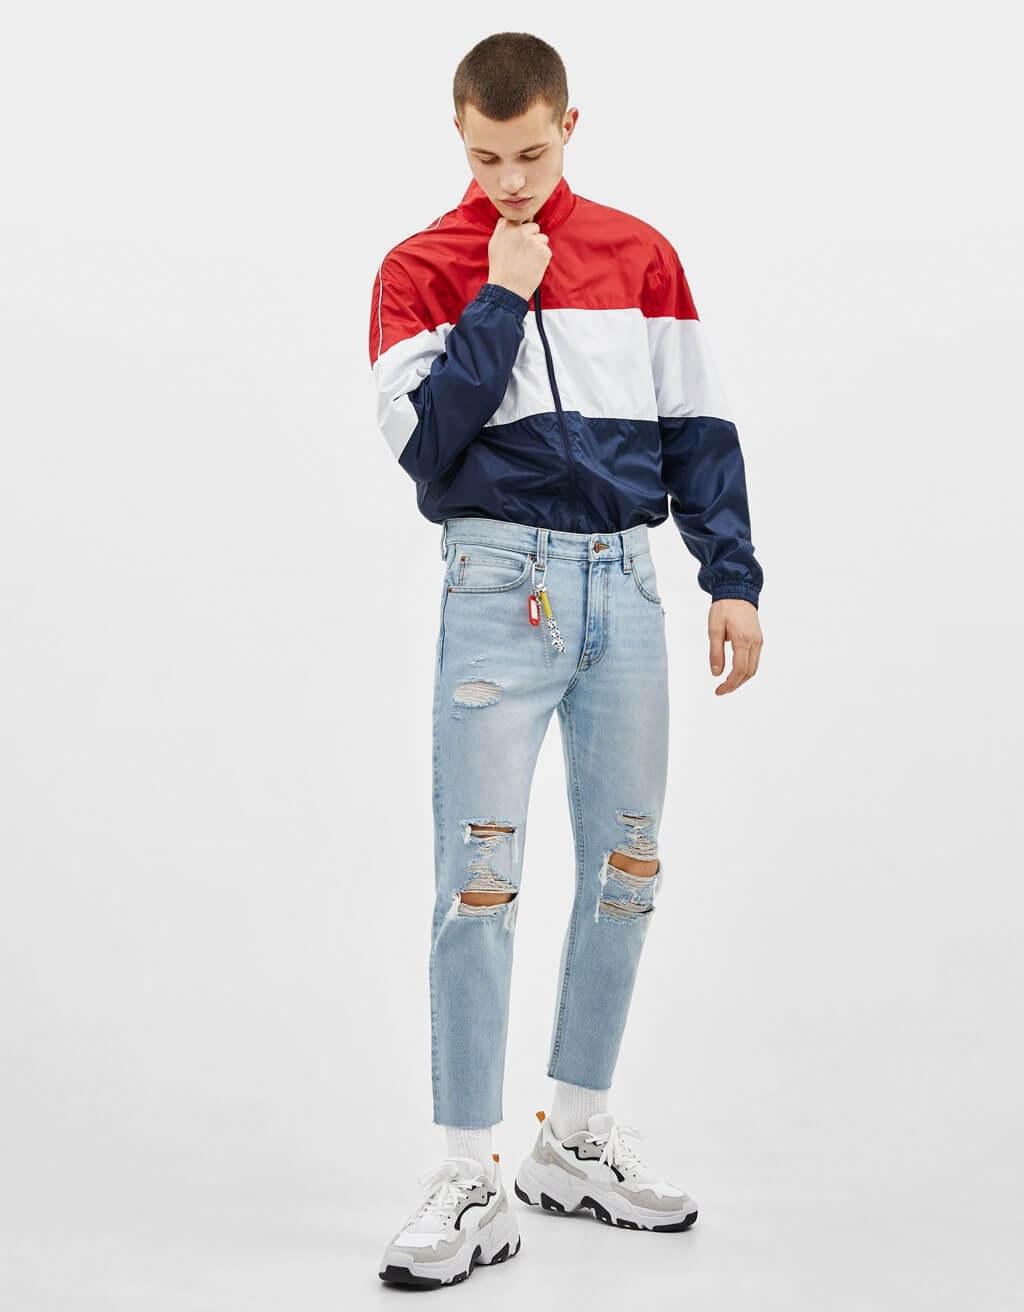 عکس شلوار جین مردانه برشکا اسپانیا Cropped-Jeans im Slim-Fit  شلوار-جین-مردانه-برشکا-اسپانیا-cropped-jeans-im-slim-fit